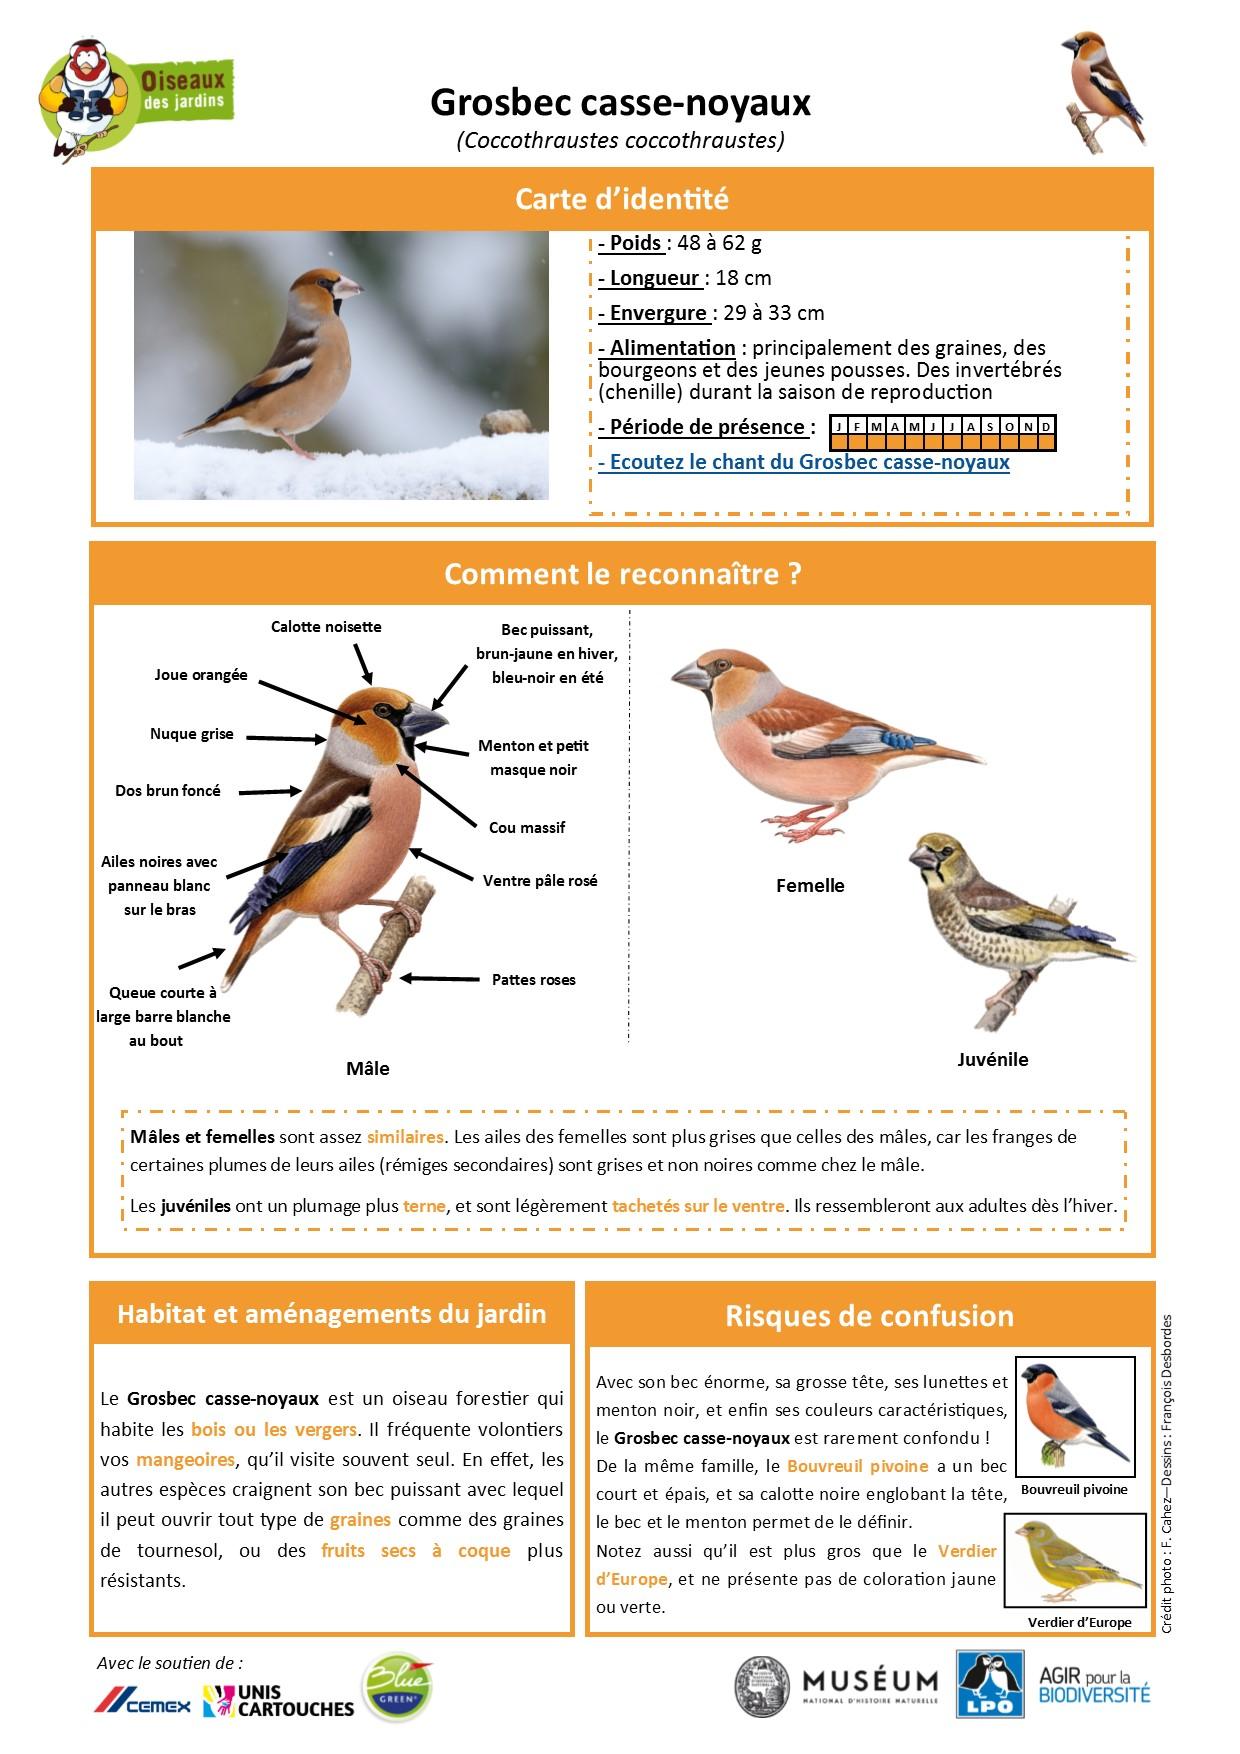 https://cdnfiles2.biolovision.net/www.oiseauxdesjardins.fr/userfiles/Fichesespces/FicheespceGB.pdf